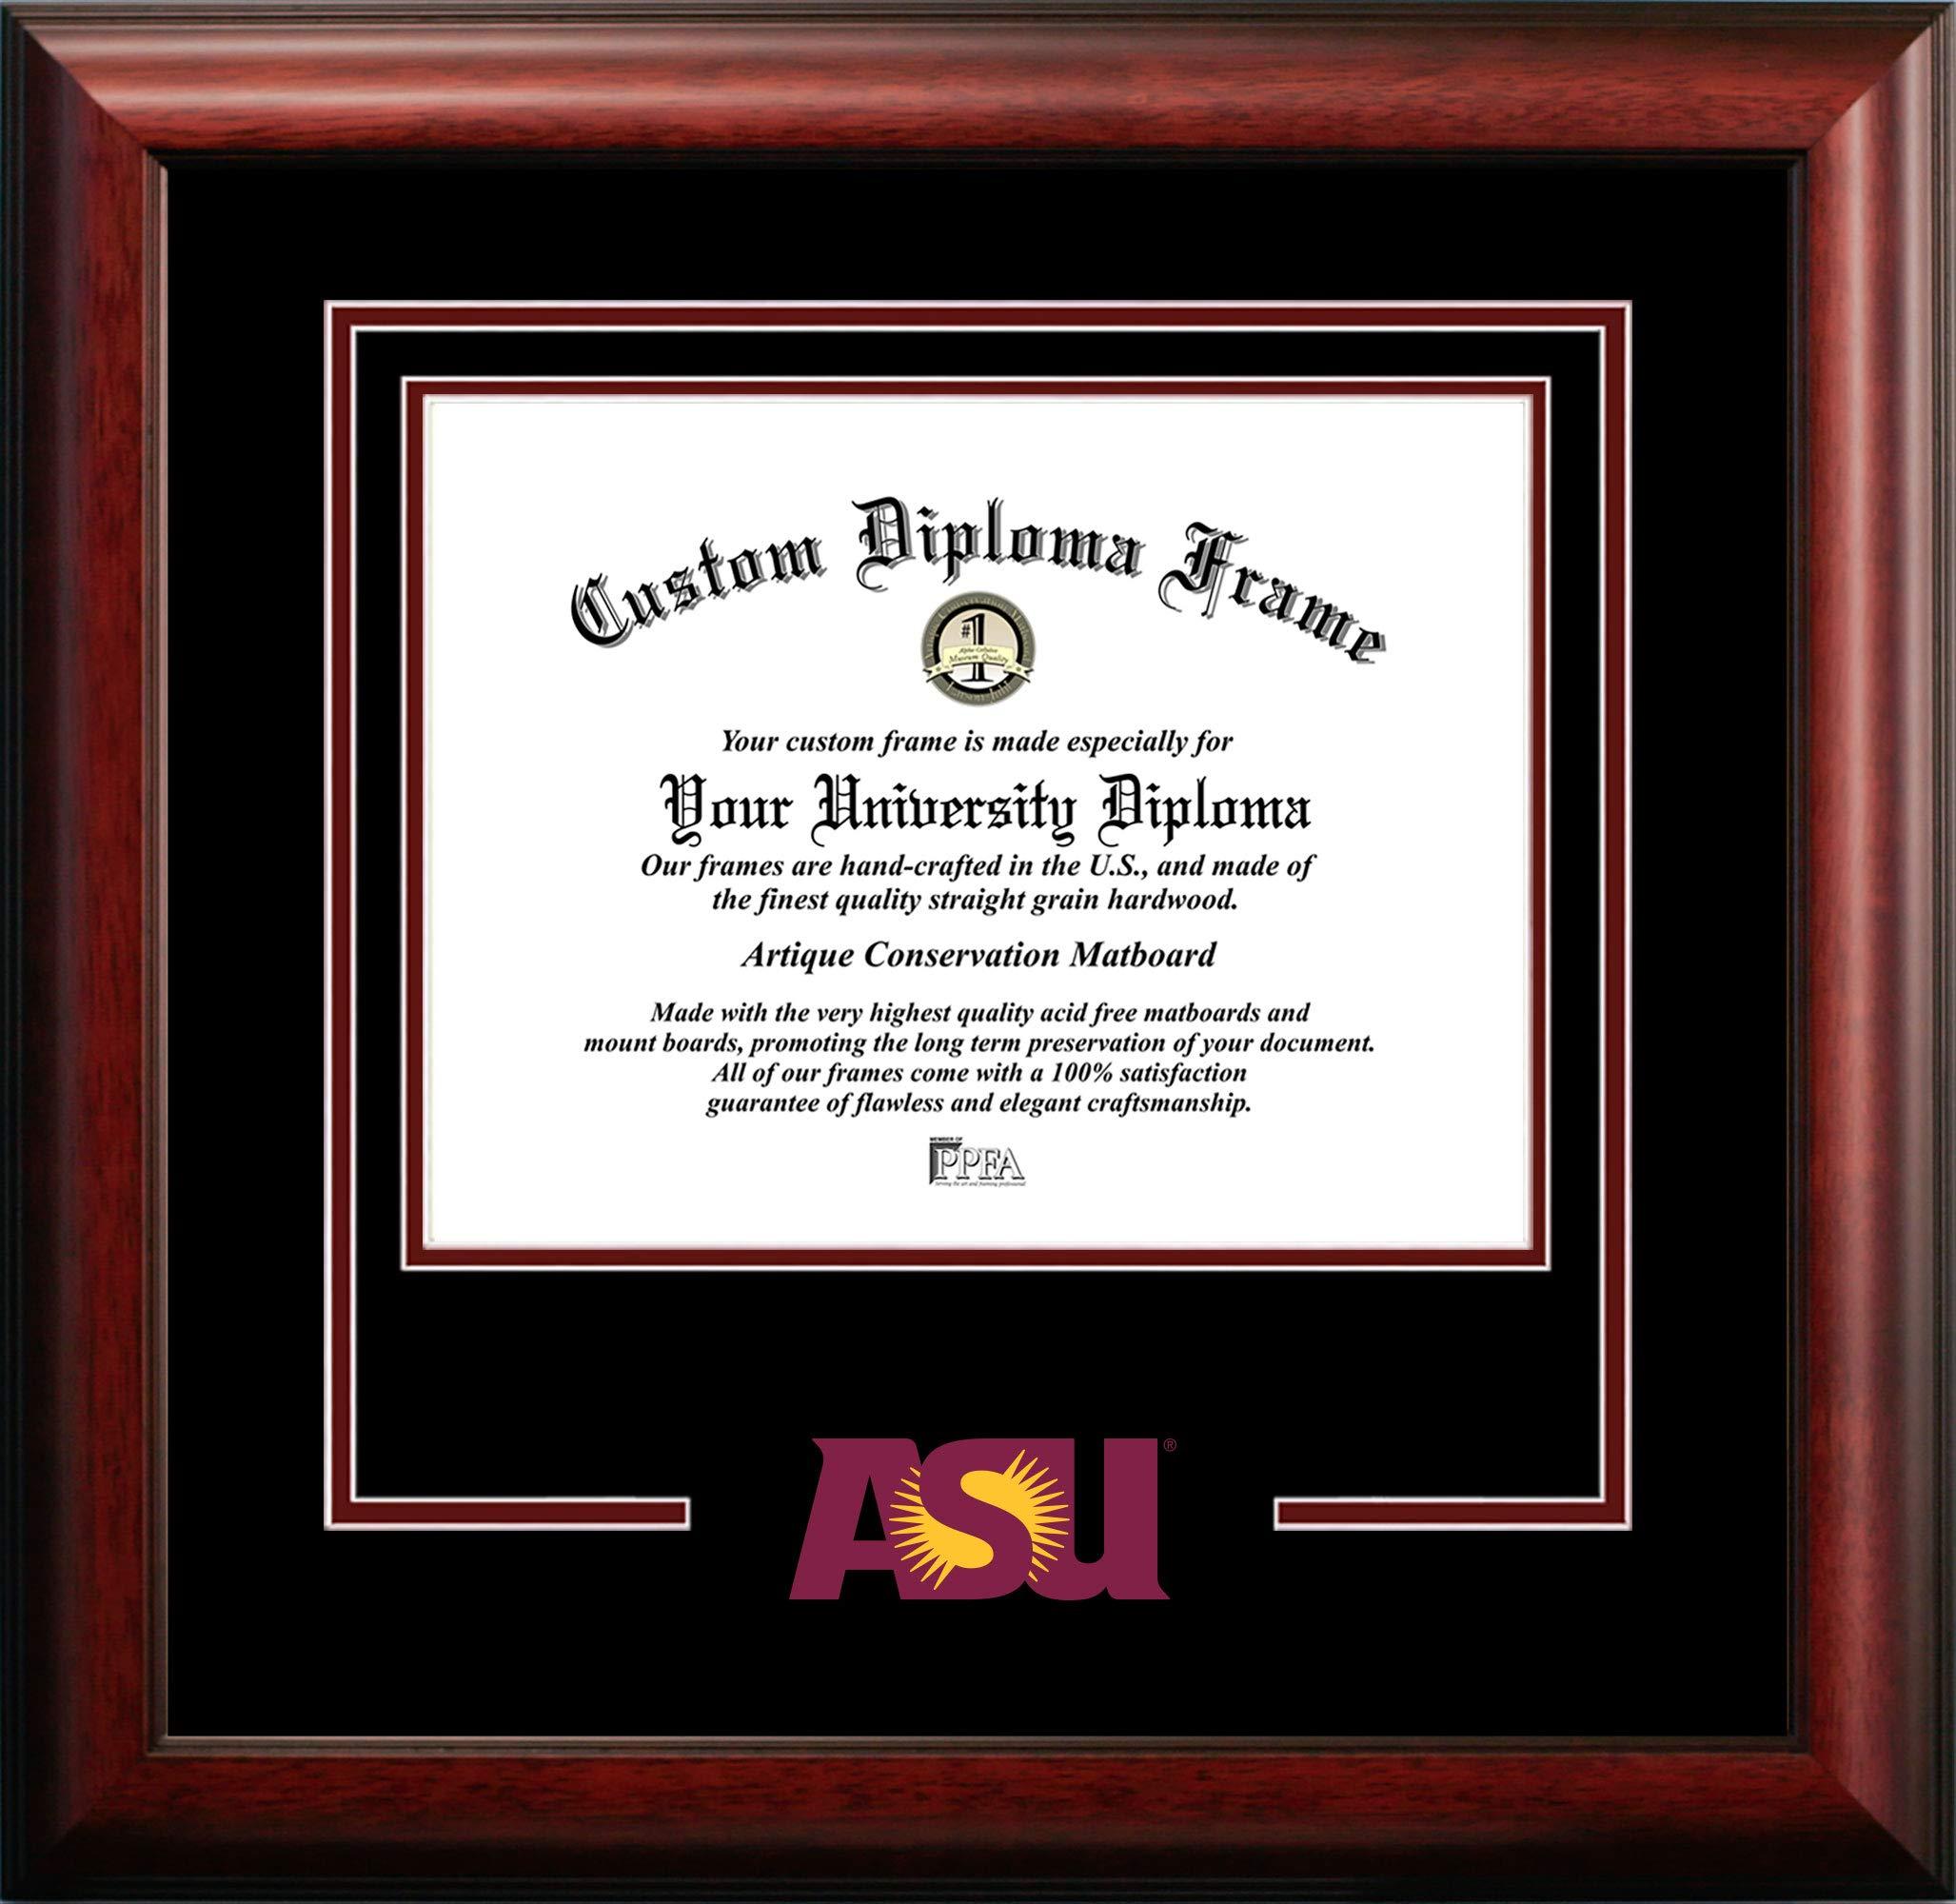 Campus Images Arizona State University Sun Devils Spirit Diploma Frame